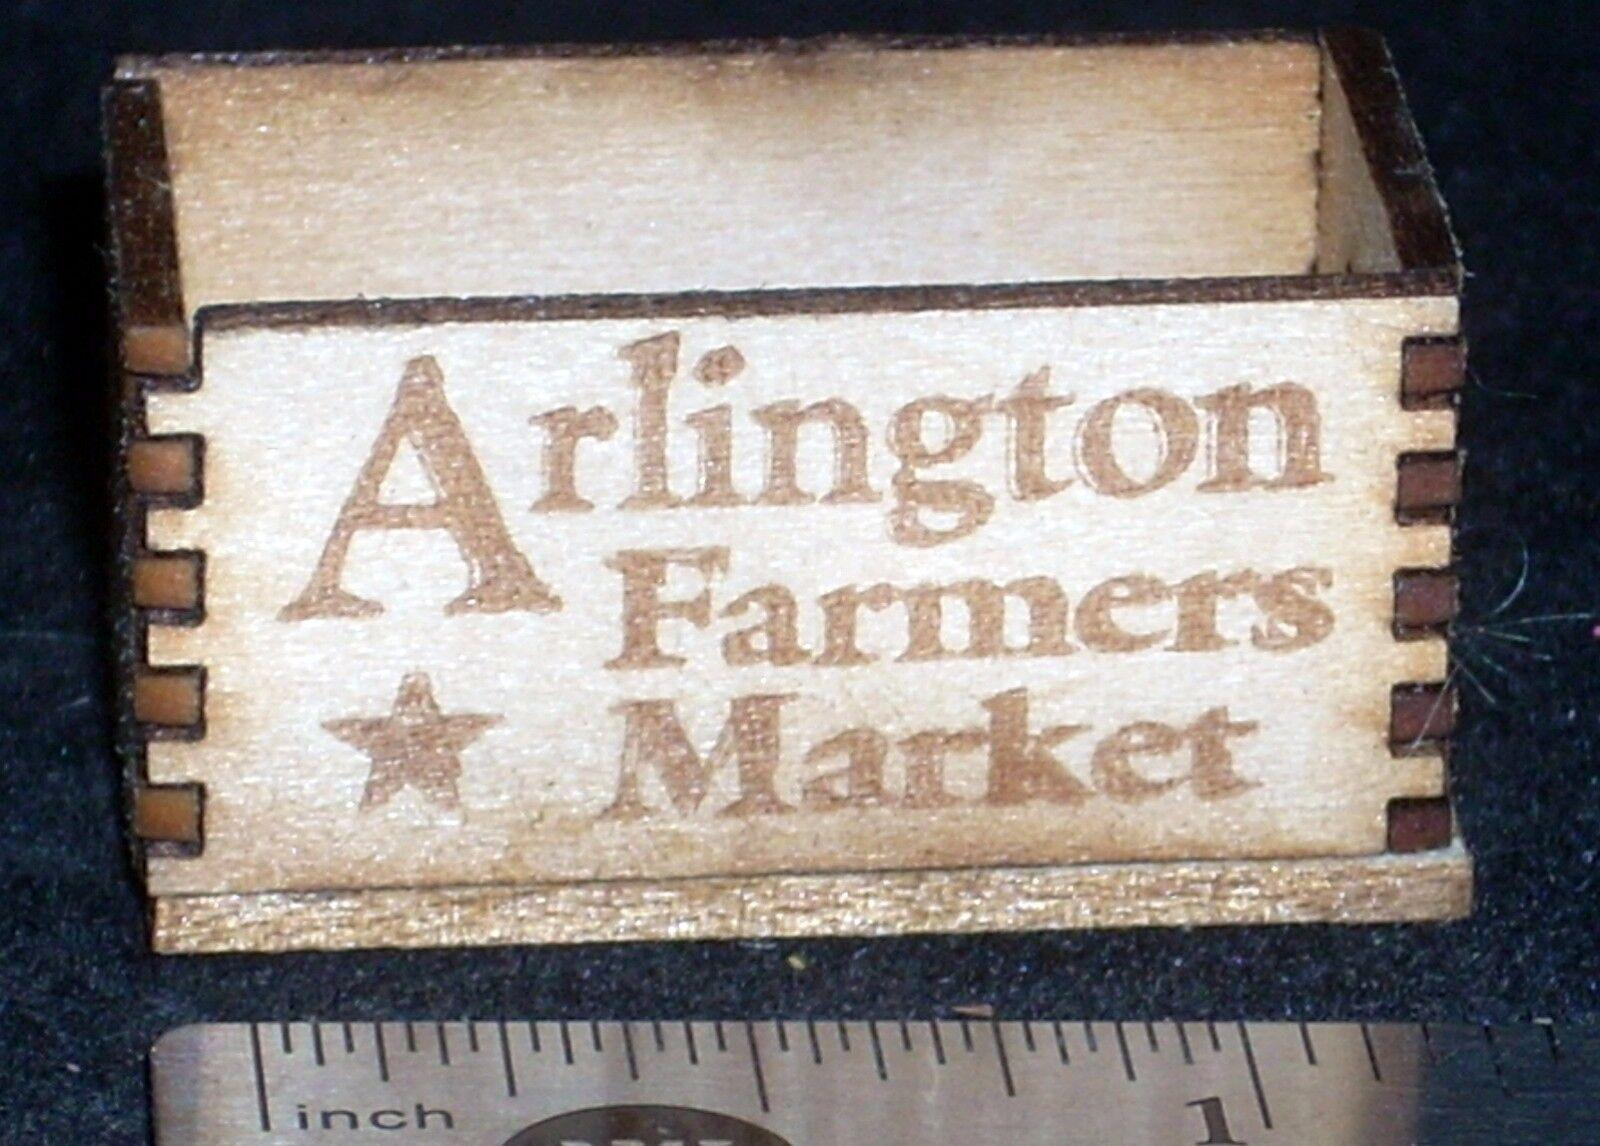 Texas Dollhouse Miniature Waxahachie Farmers Market Produce Crate 1:12